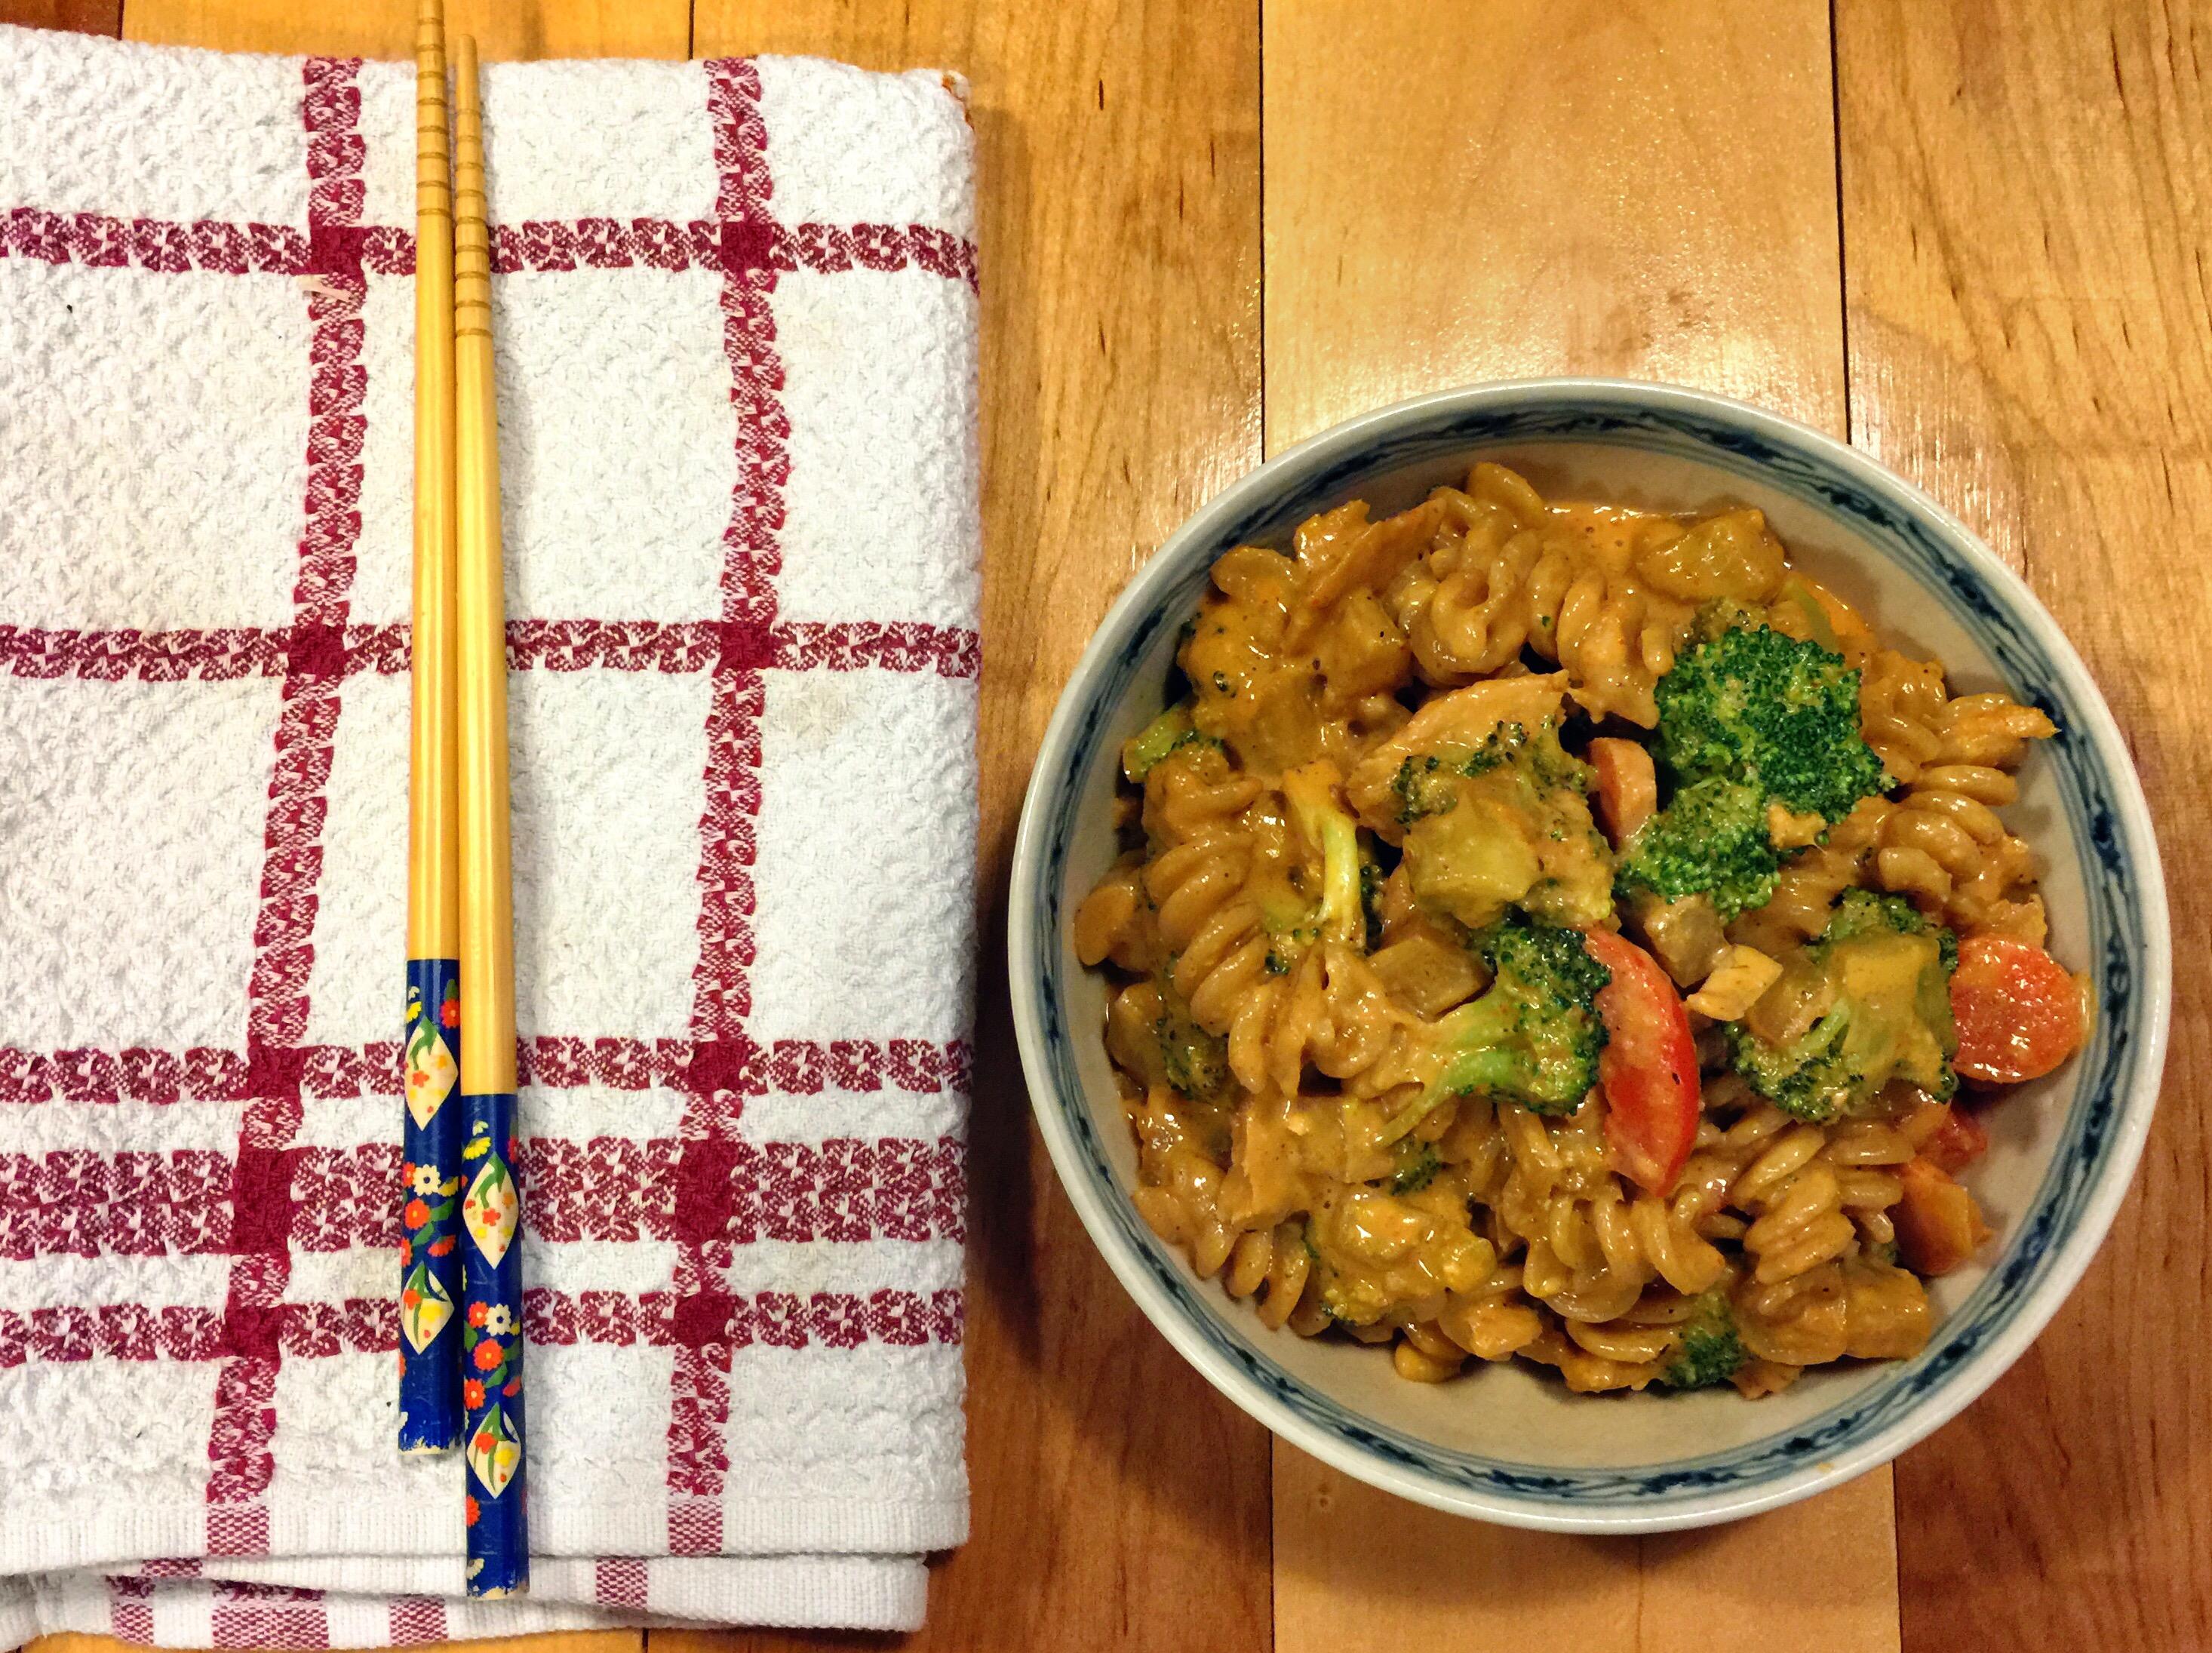 spicy peanut pasta served with chopsticks